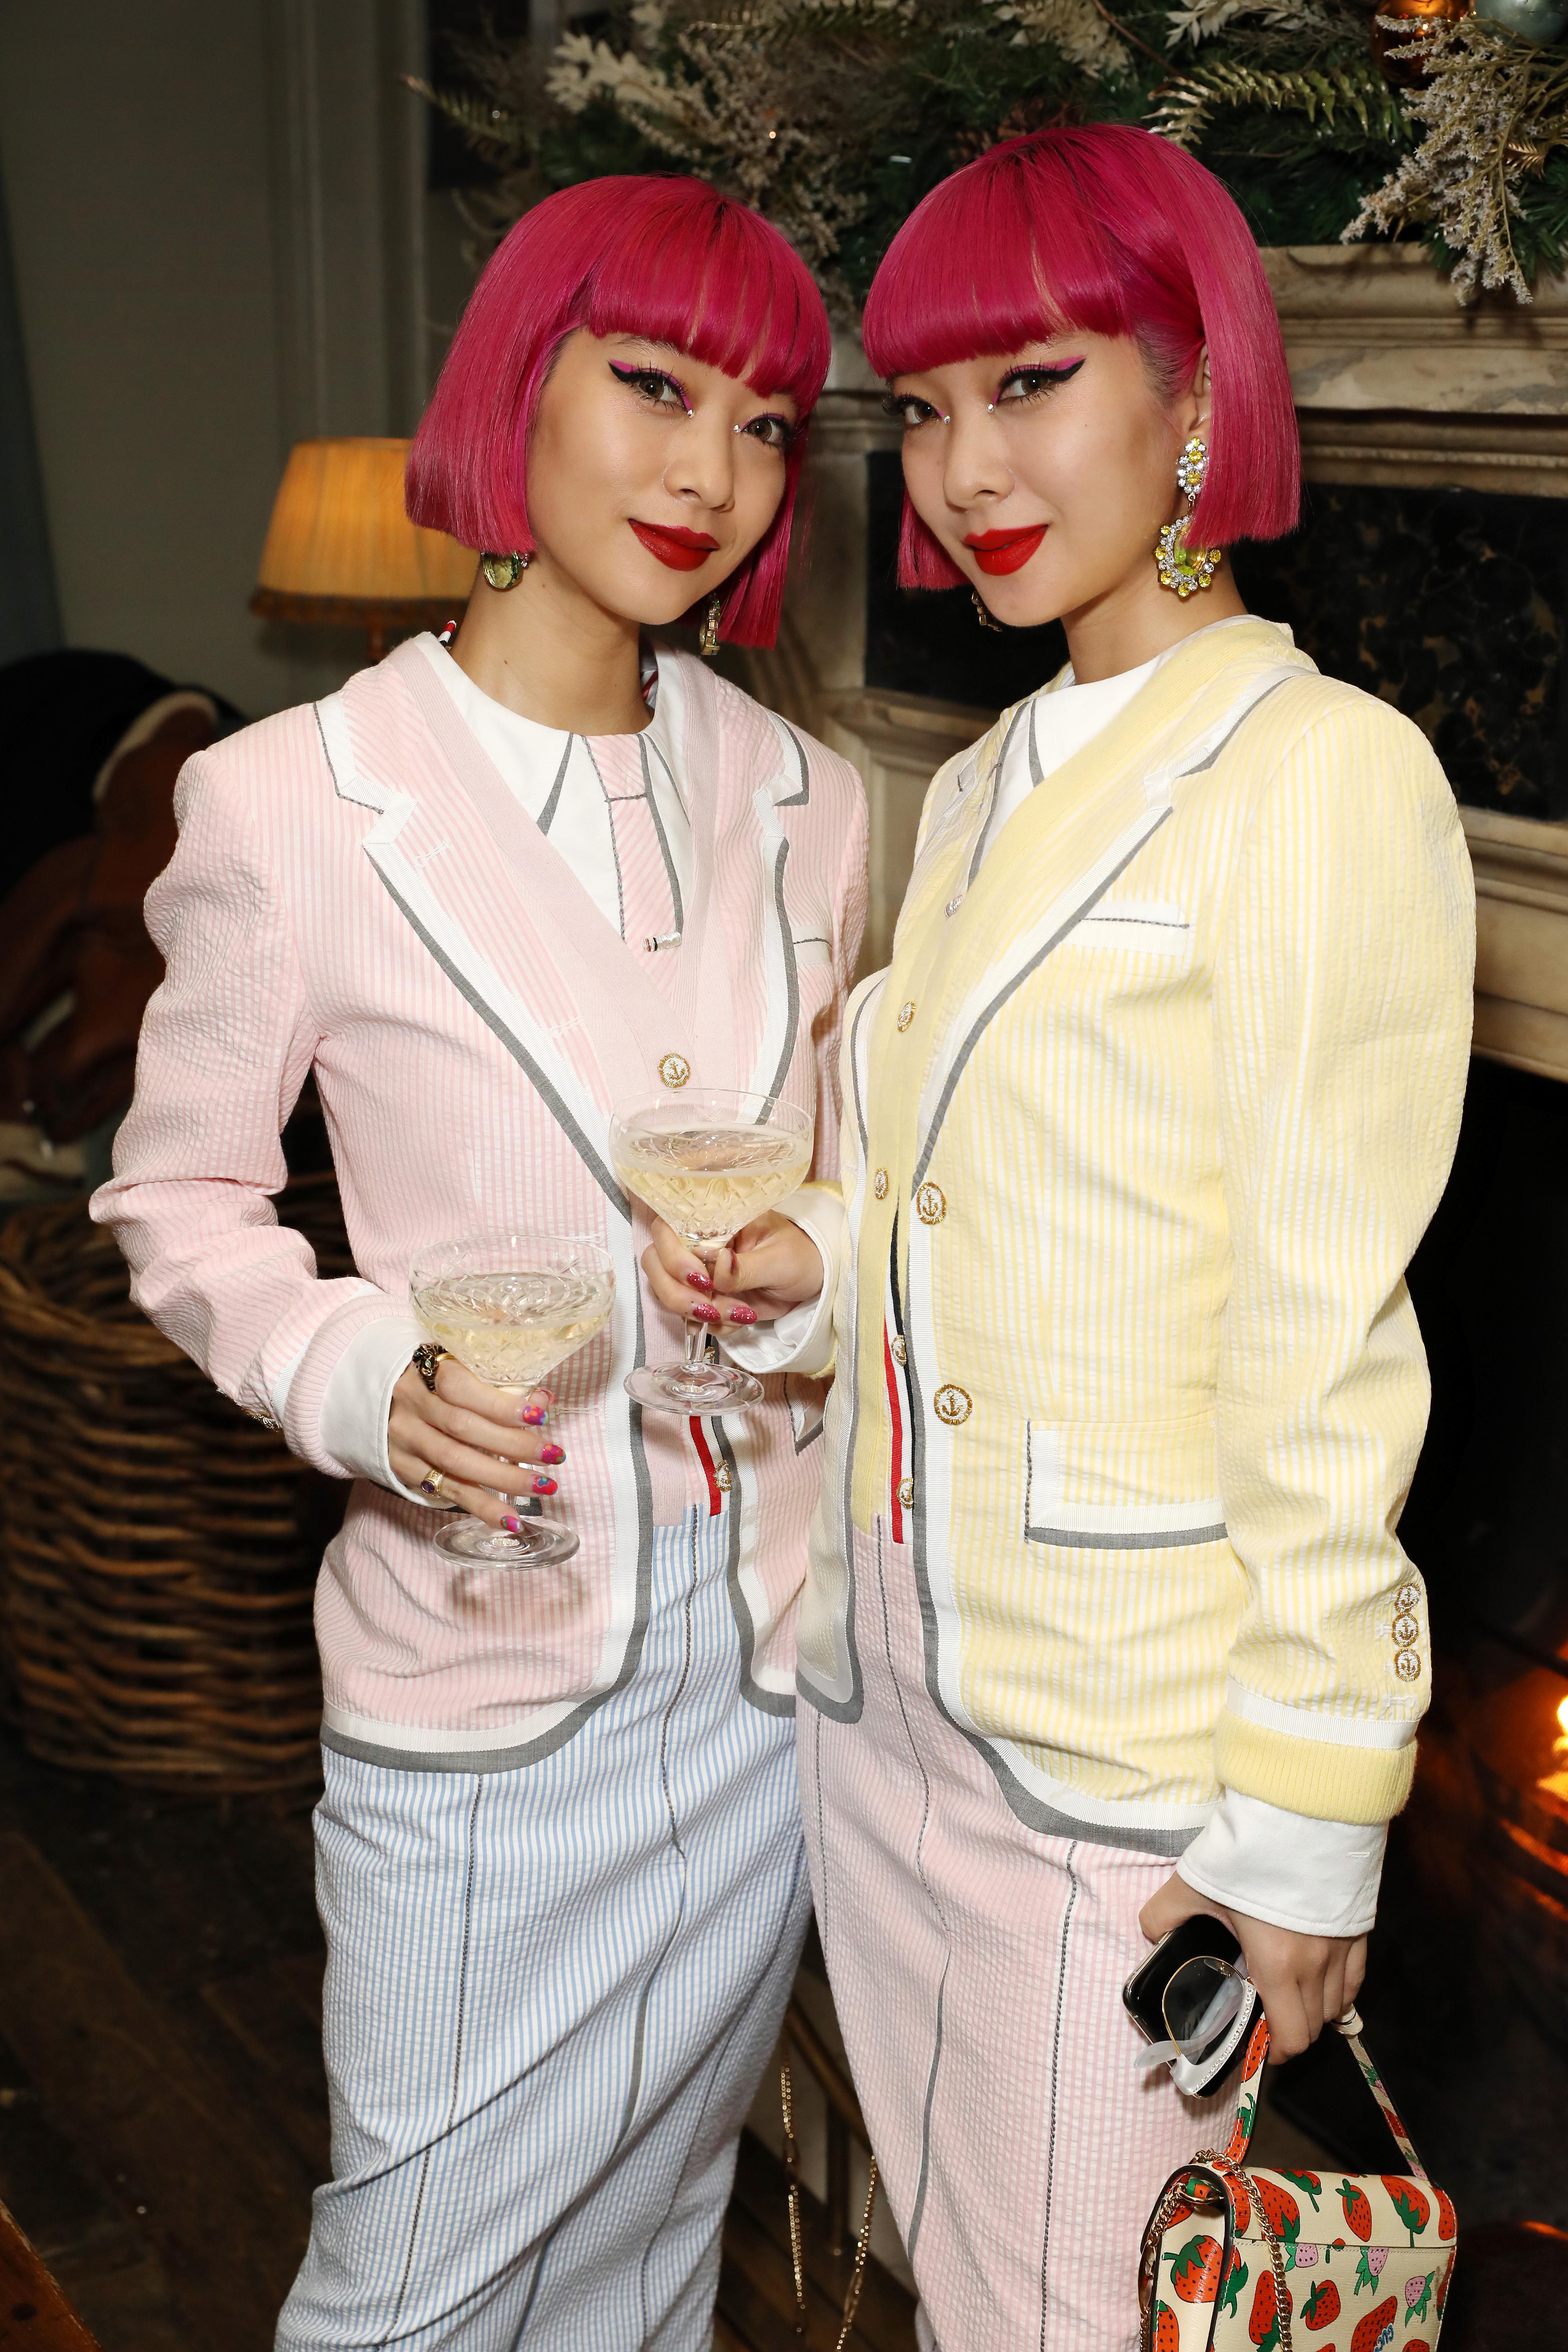 Japanese influencer Ami and Aya